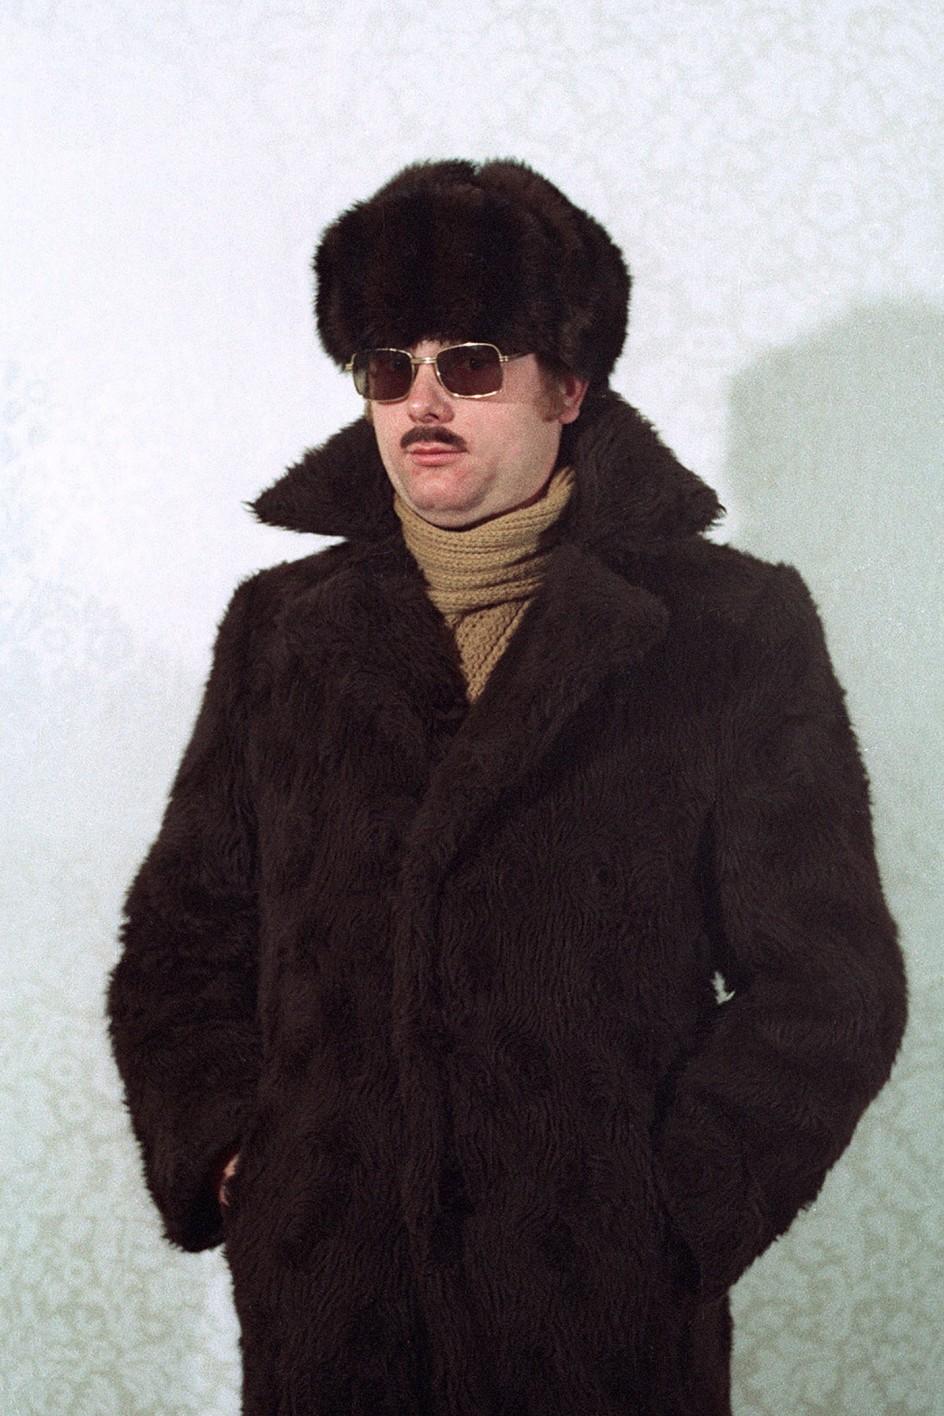 Simon Menner, Untitled, 2013, Stasi agent during a seminar on disguises. Un agente de la Stasi en un seminario sobre técnicas de disfraces